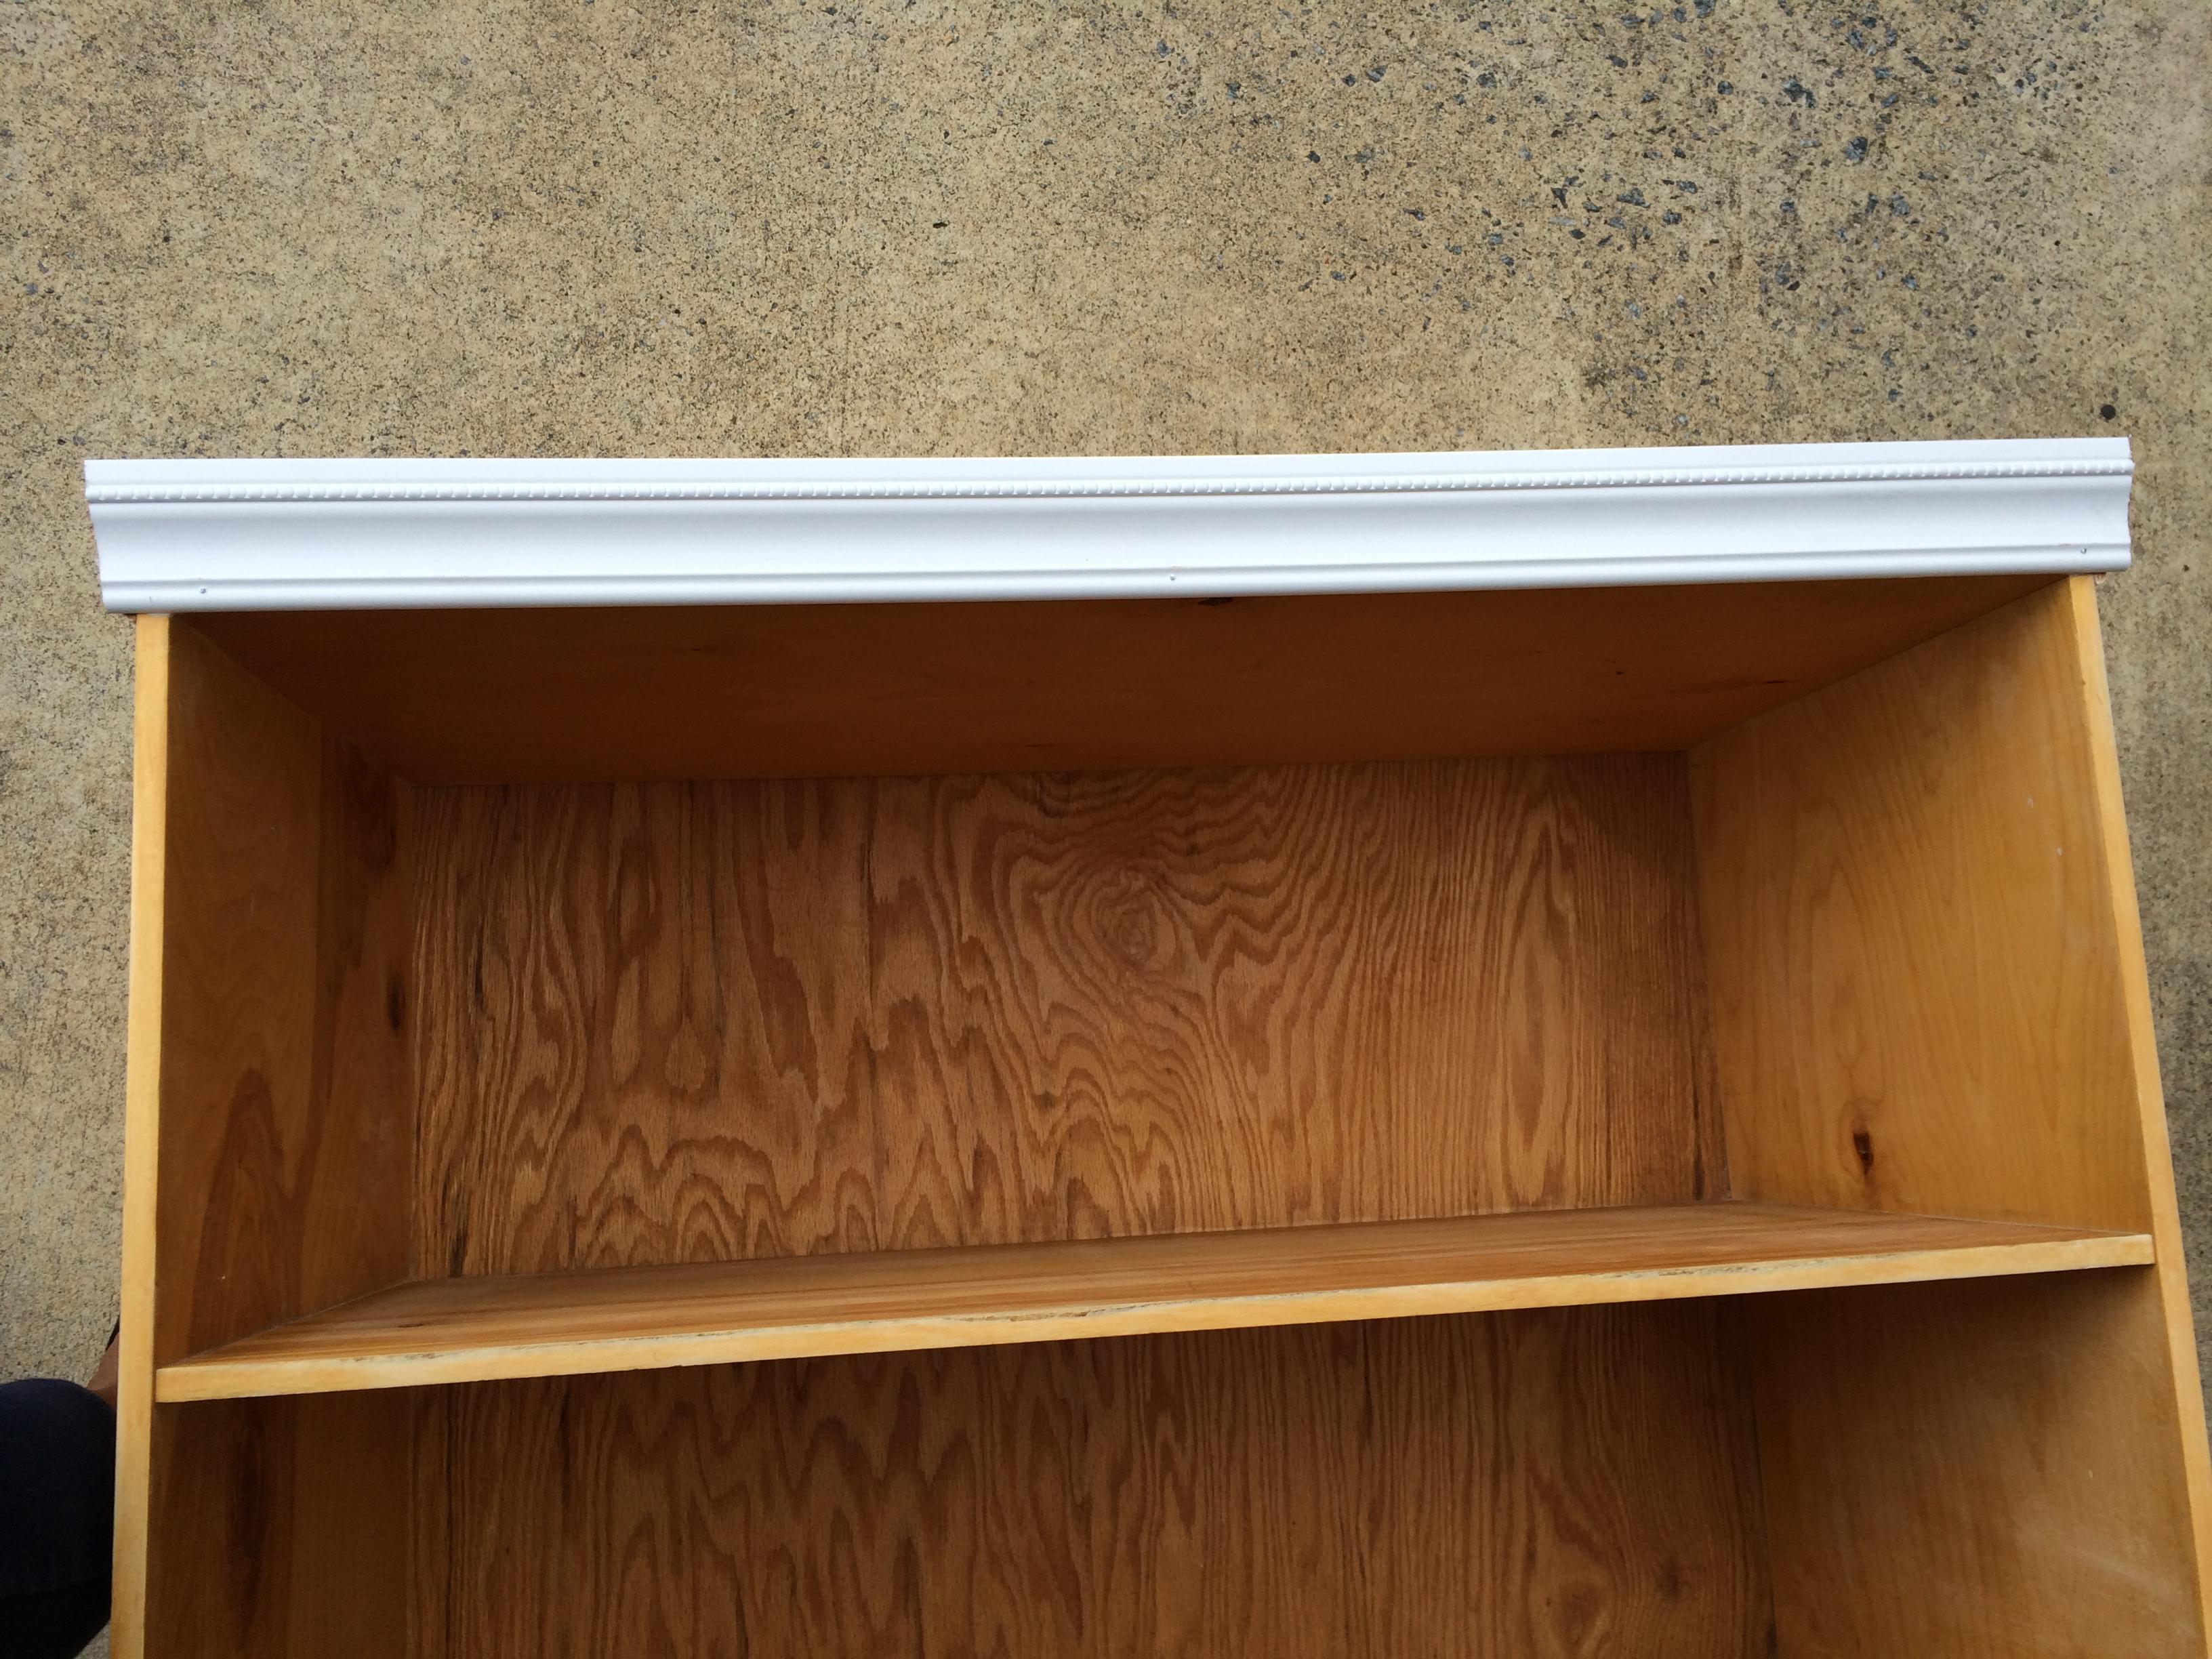 Adding Trim To The Bookcase Top